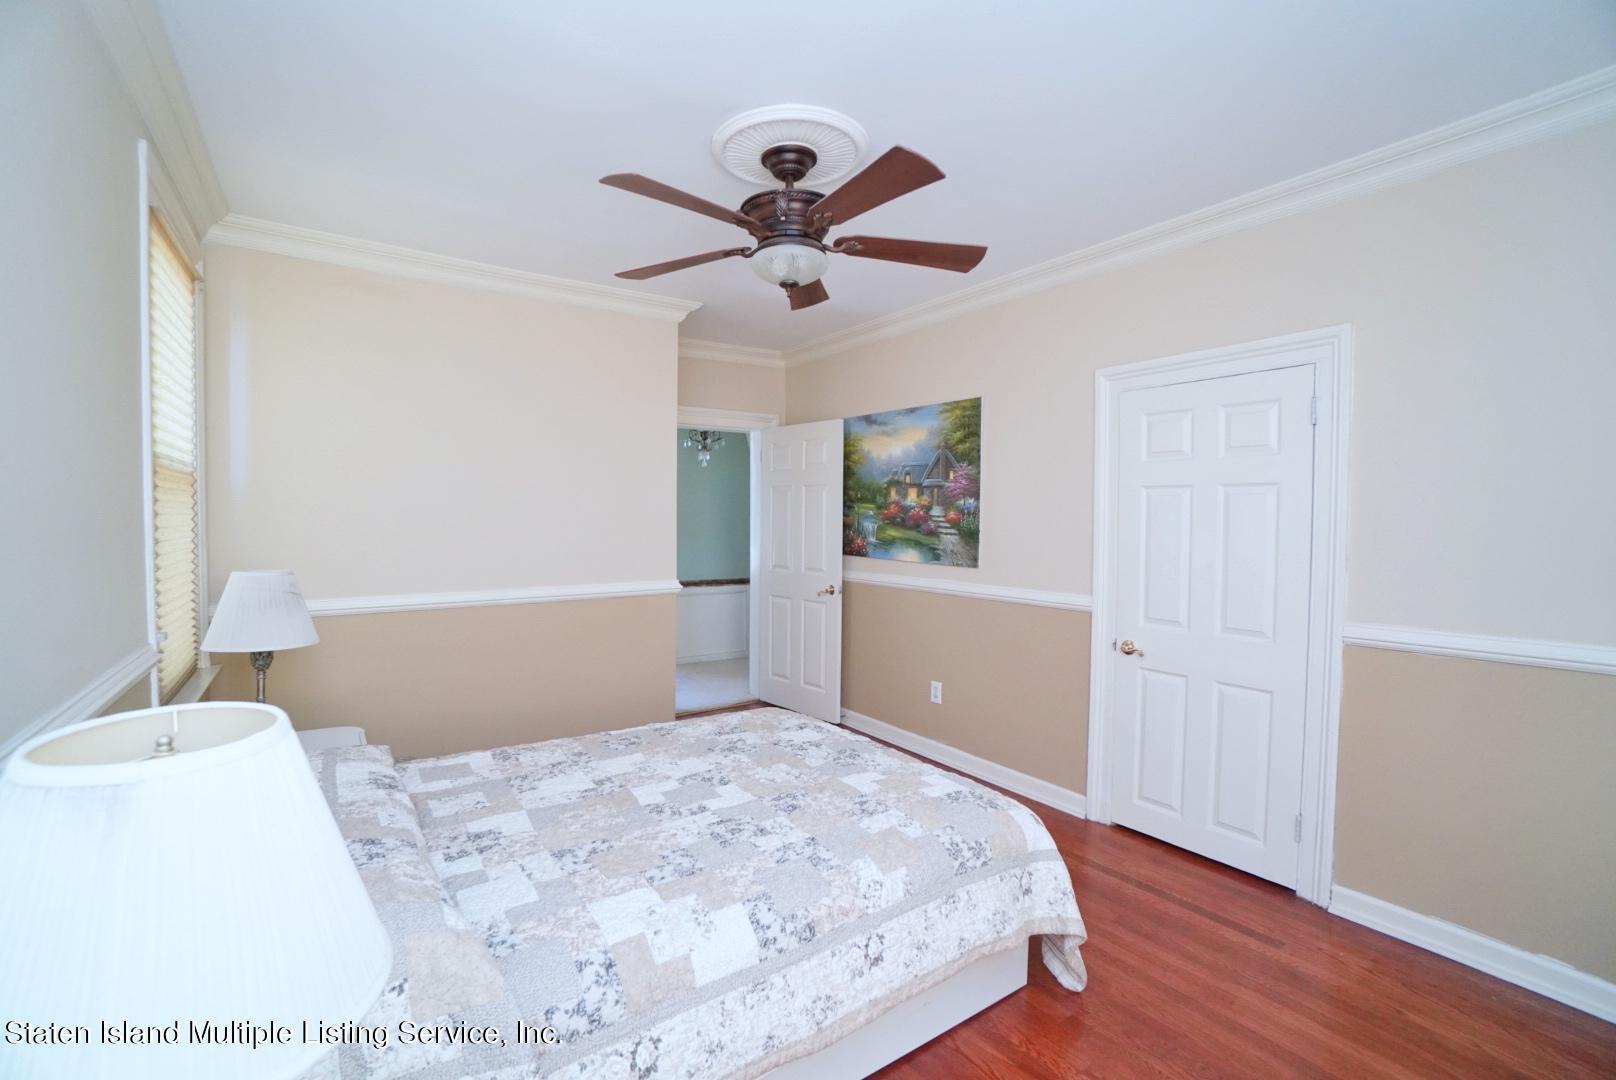 Single Family - Detached 264 Fisher Avenue  Staten Island, NY 10307, MLS-1146898-37